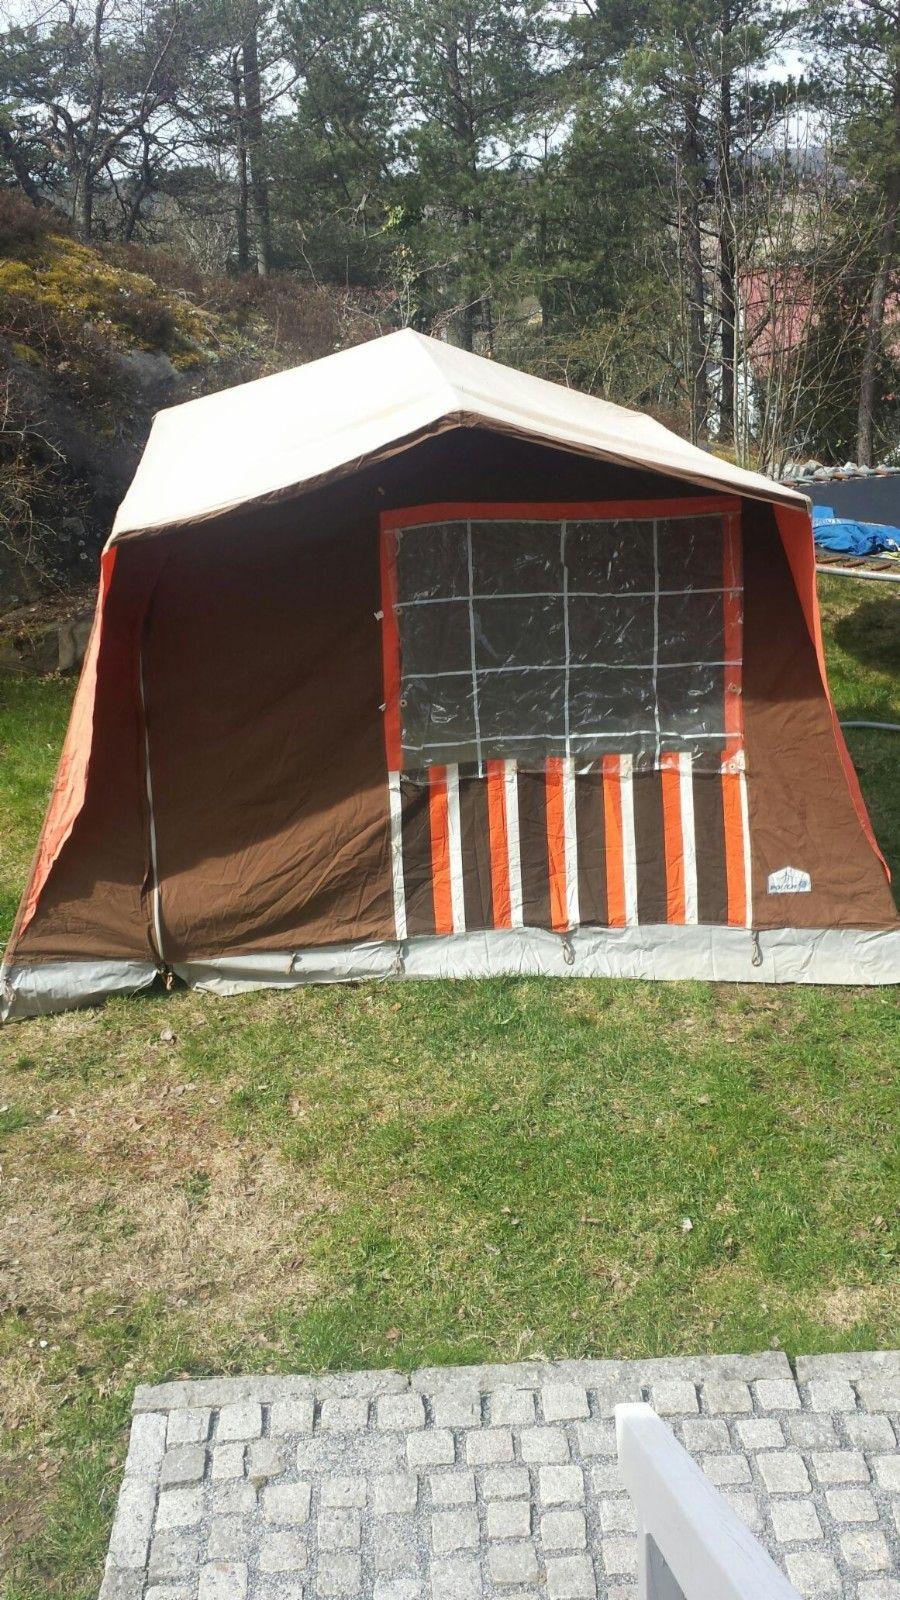 Hustelt retrotelt familietelt villatelt telte | FINN.no